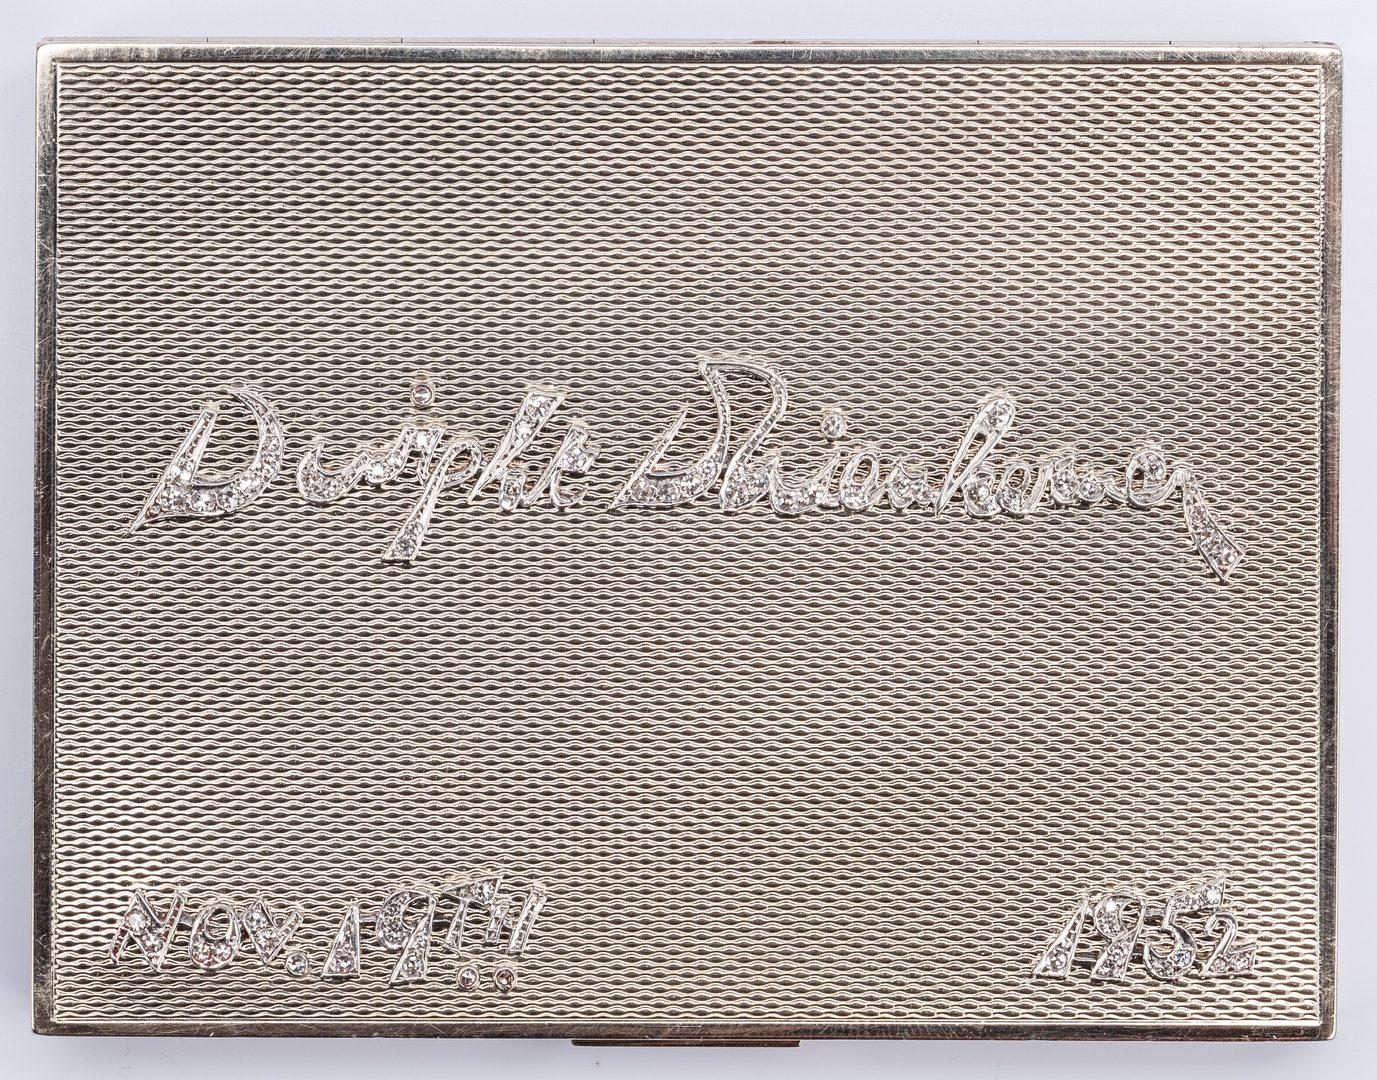 Lot 47: 14K Plat. Dwight Eisenhower Presentation Gift